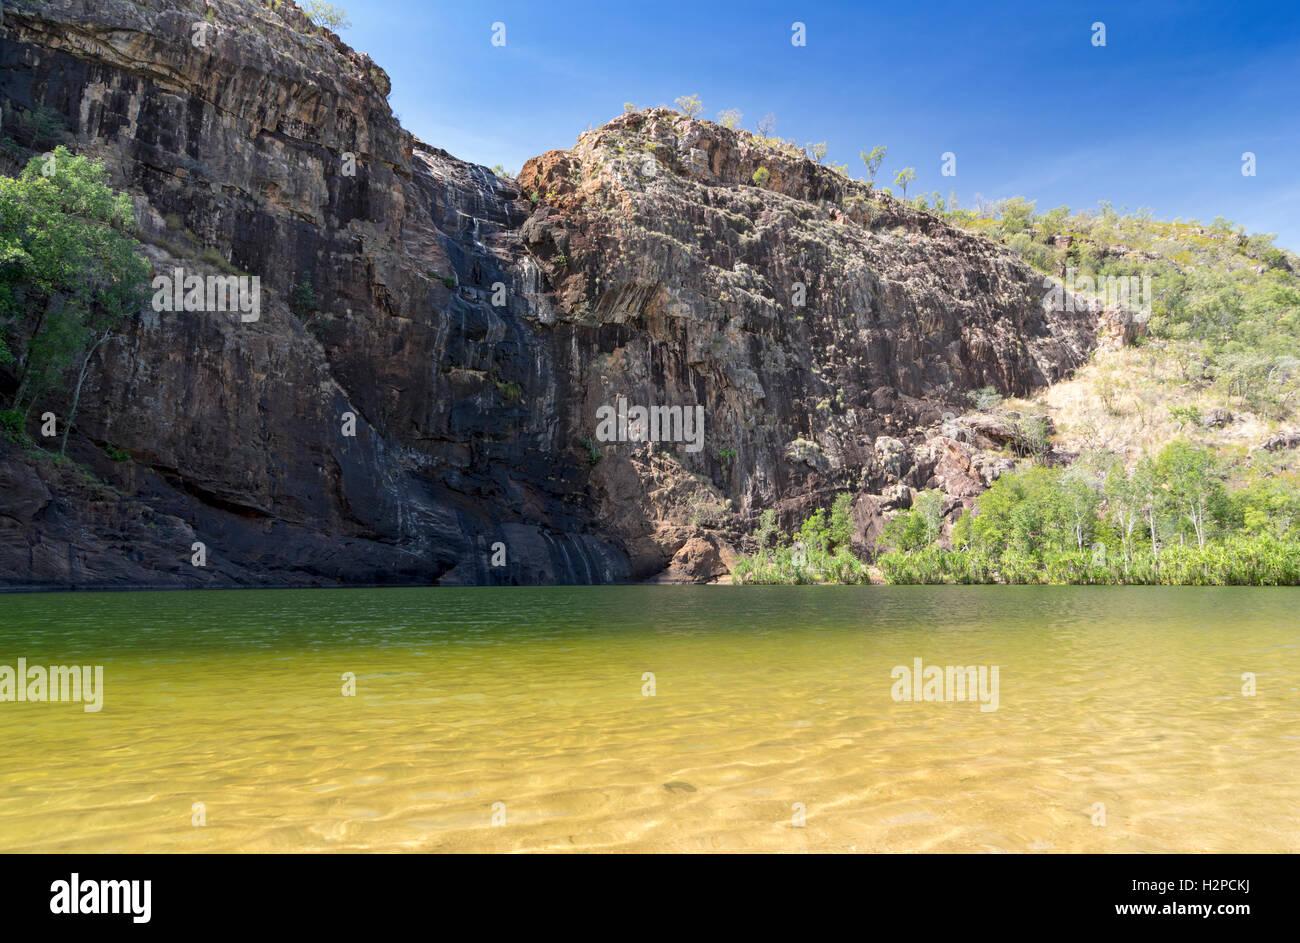 Gunlom Billabong in the Kakadu National Park, Northern Territory, Australia. - Stock Image